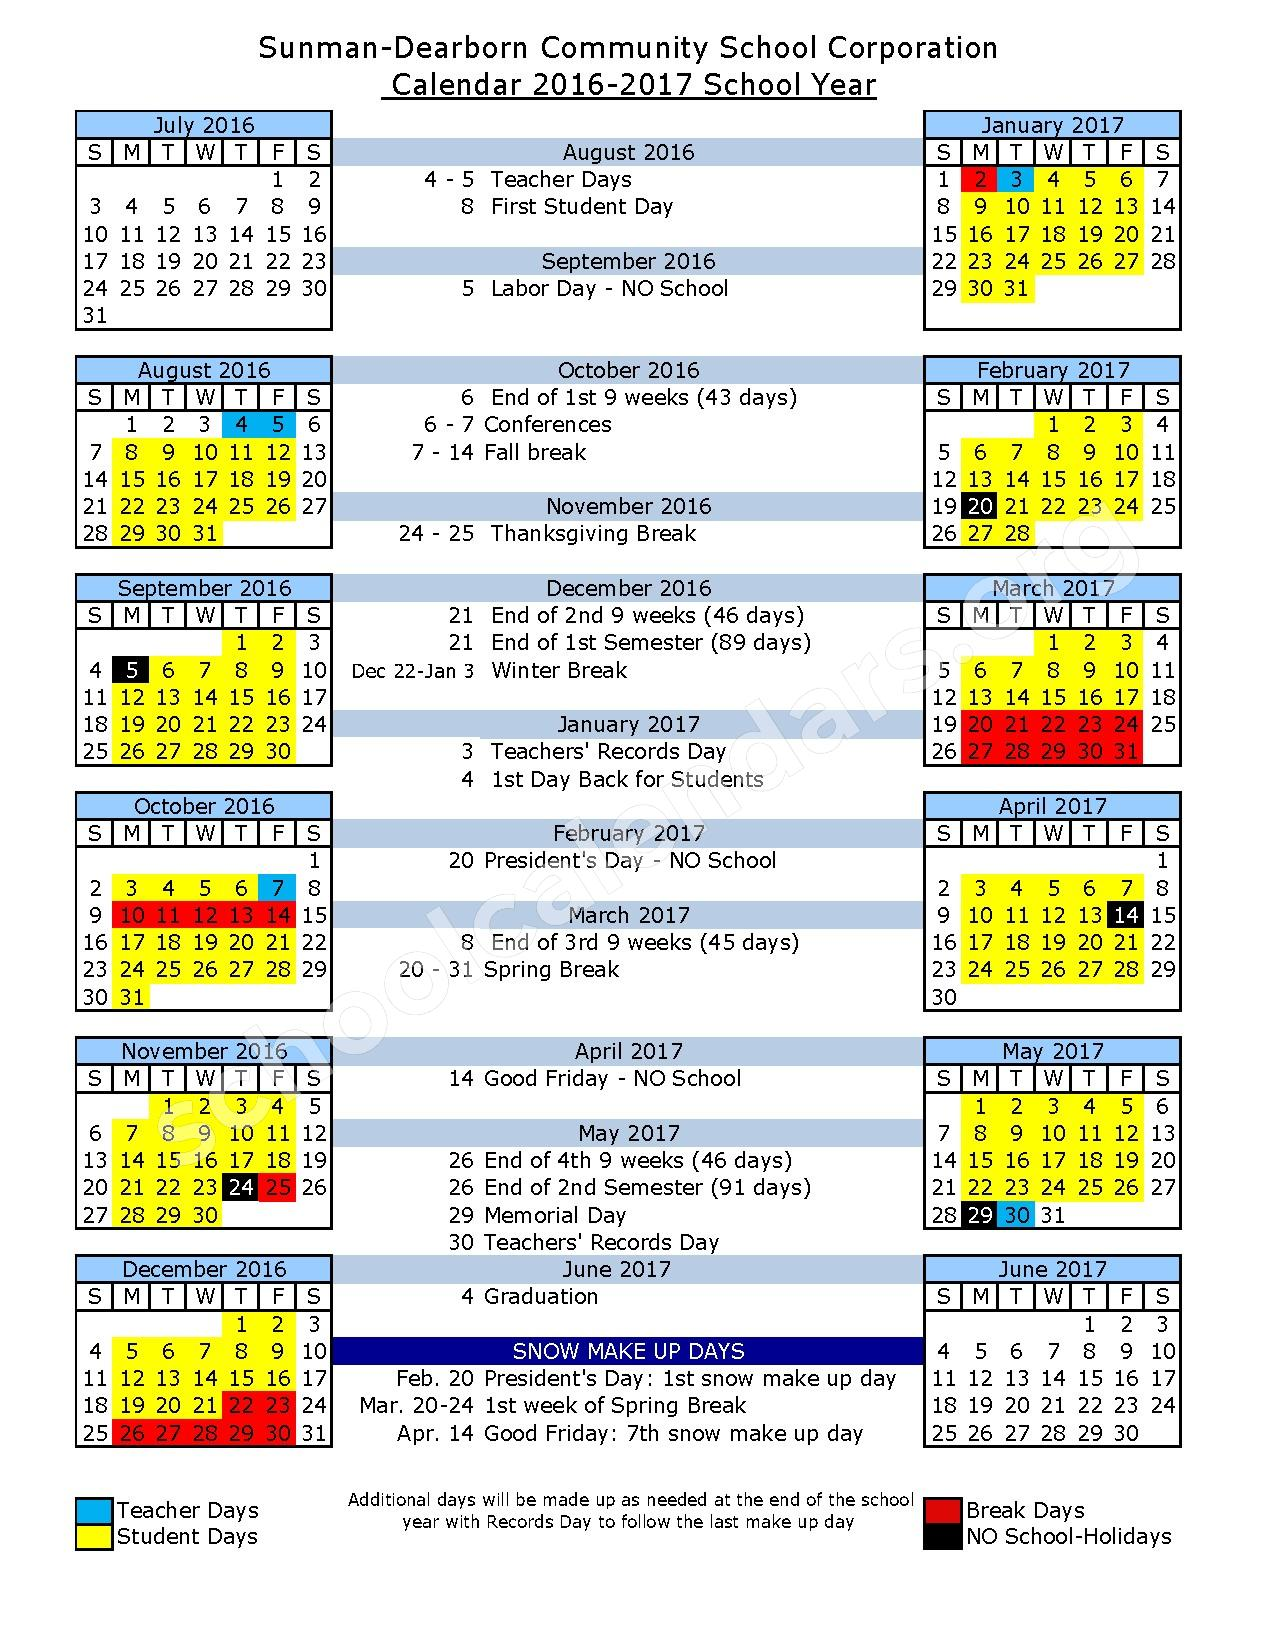 2016 - 2017 School Calendar – Sunman-Dearborn Community School Corporation – page 1